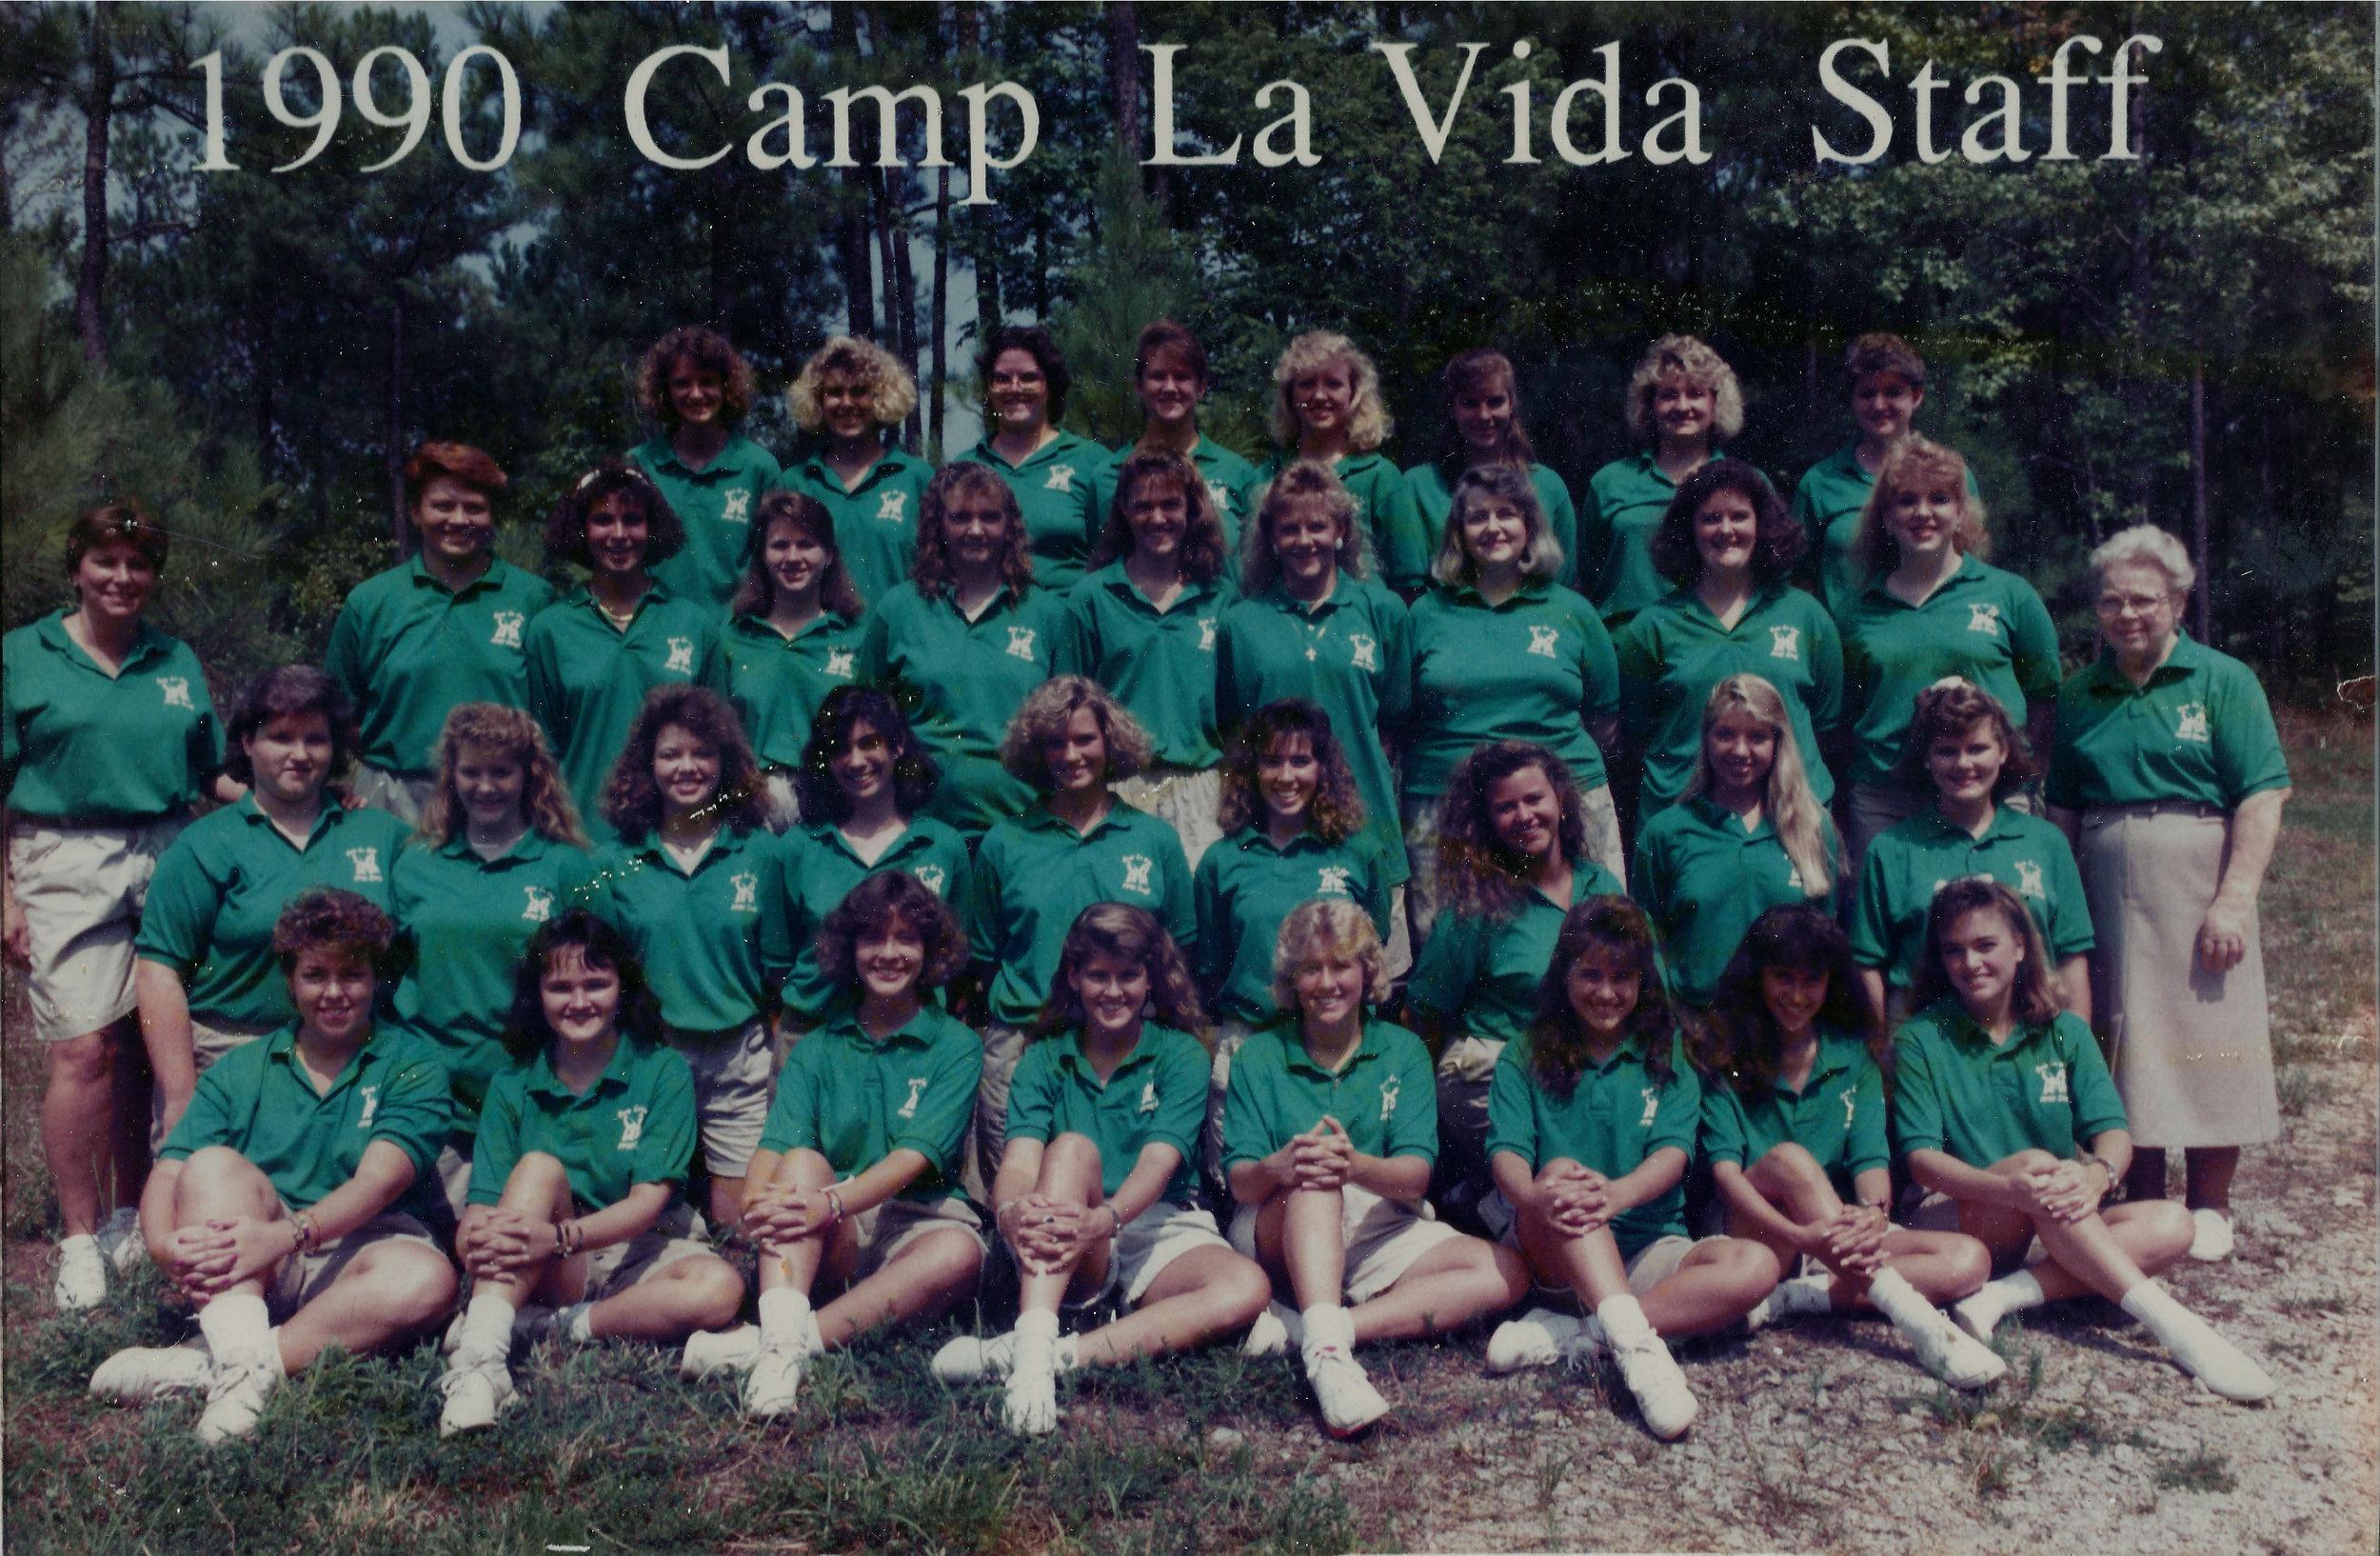 CLV staff 1990.jpg